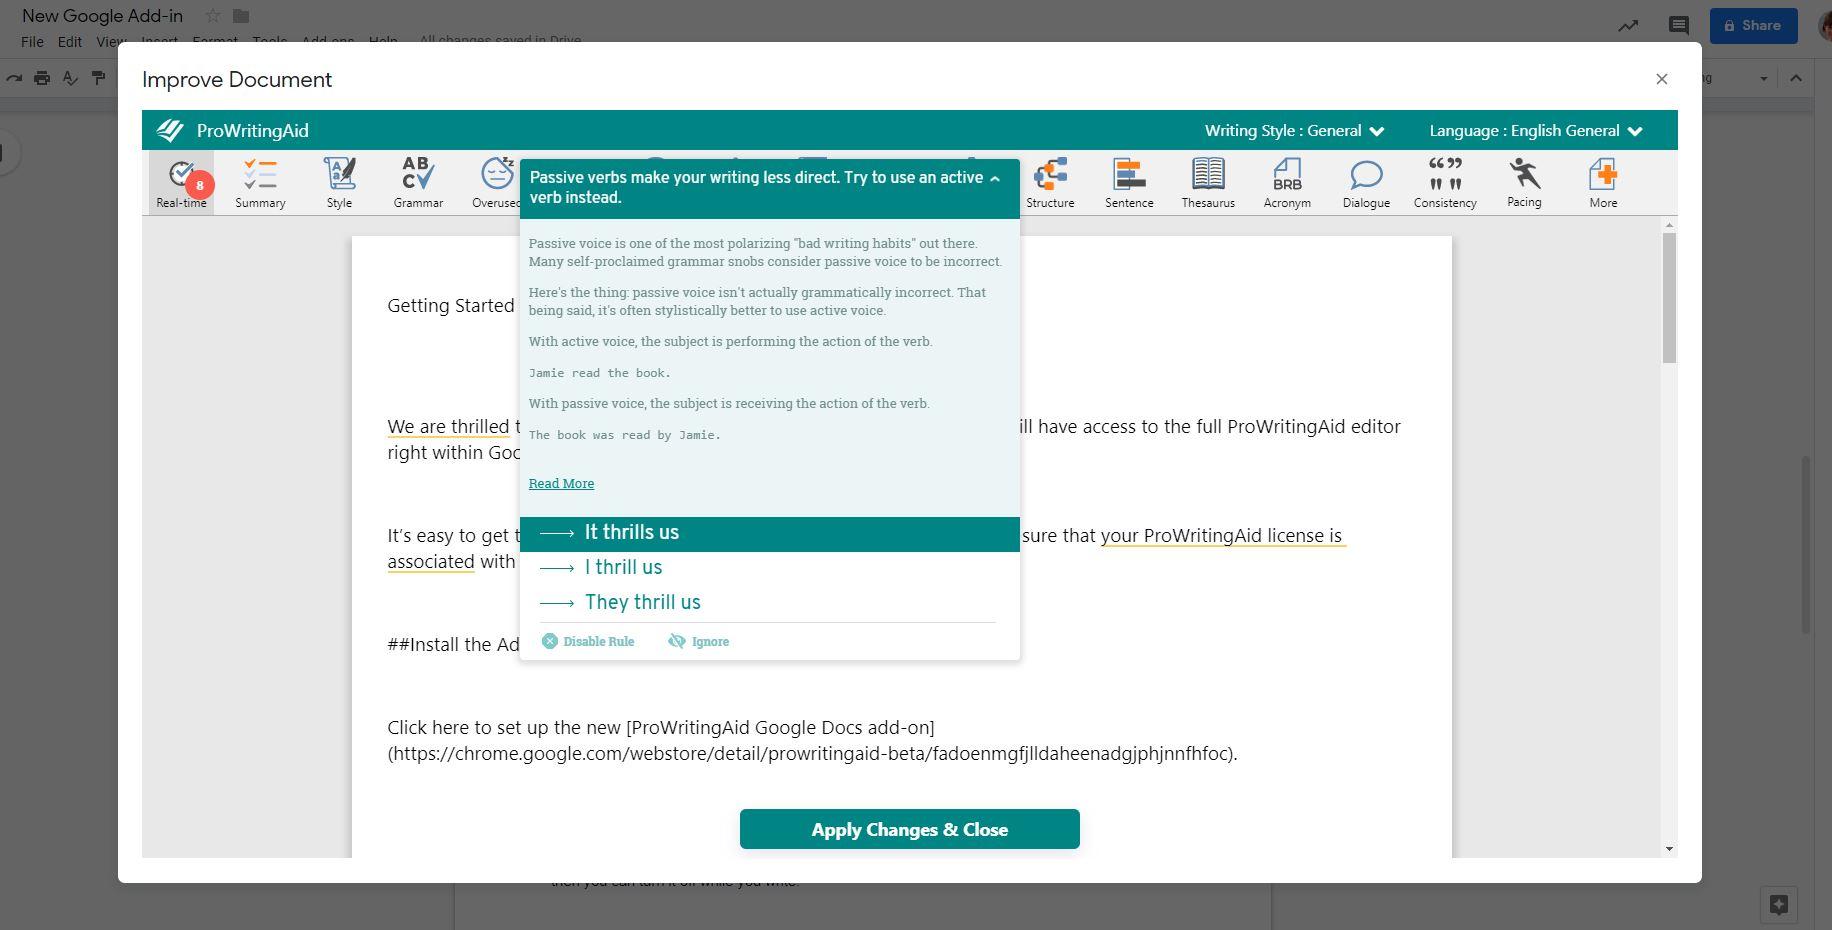 ProWritingAid in GoogleDocs